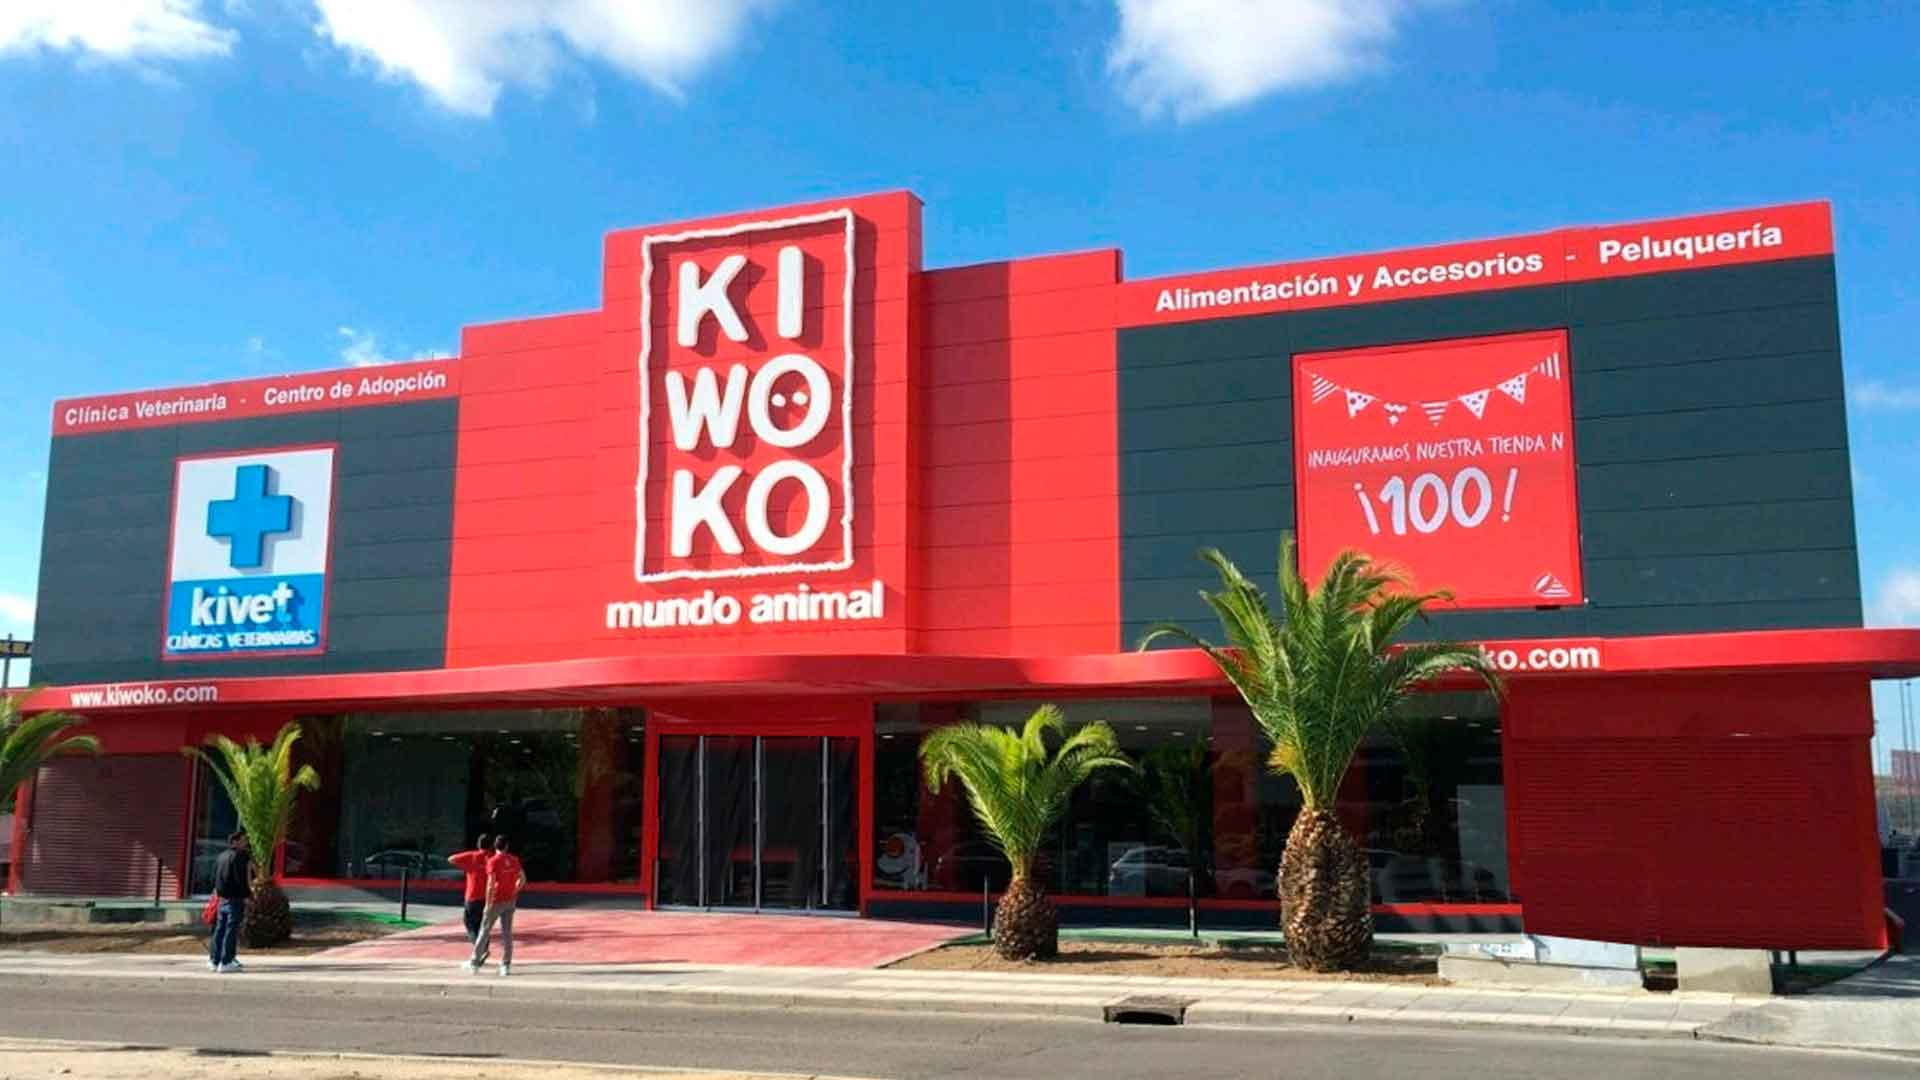 Reforma local Kiwoko Madrid GyC Espacios